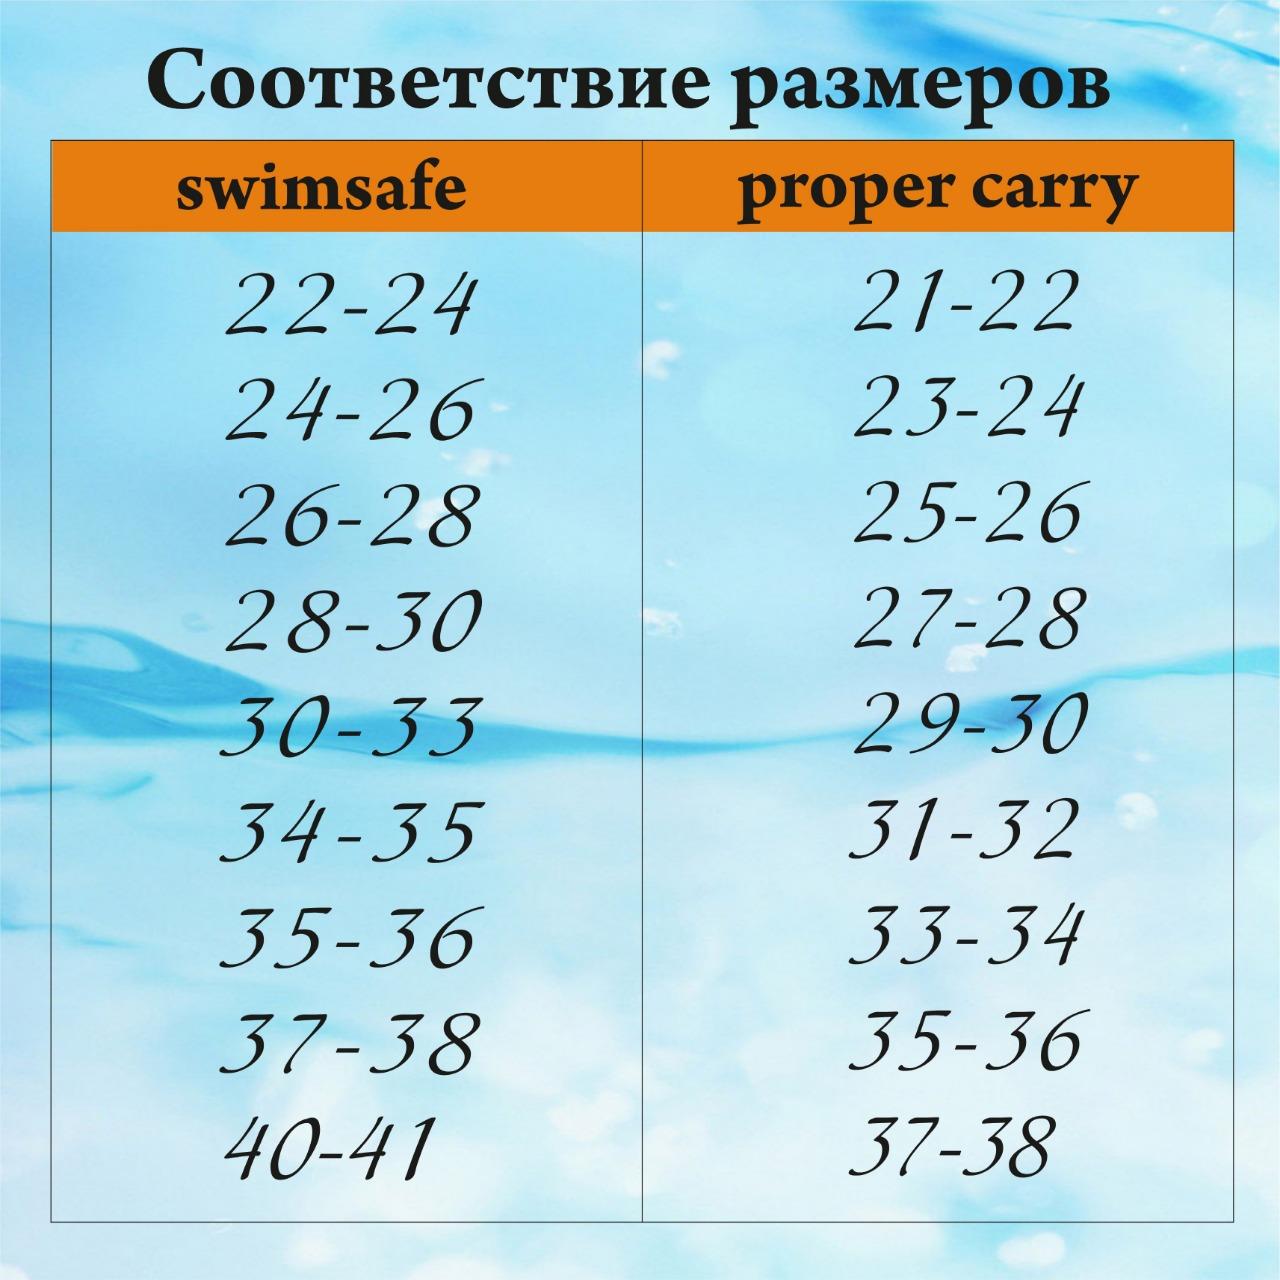 Детские ласты для плавания Proper-Carry Super Elastic р. 21-22, 23-24, 25-26, 27-28, 29-30, - фото 4